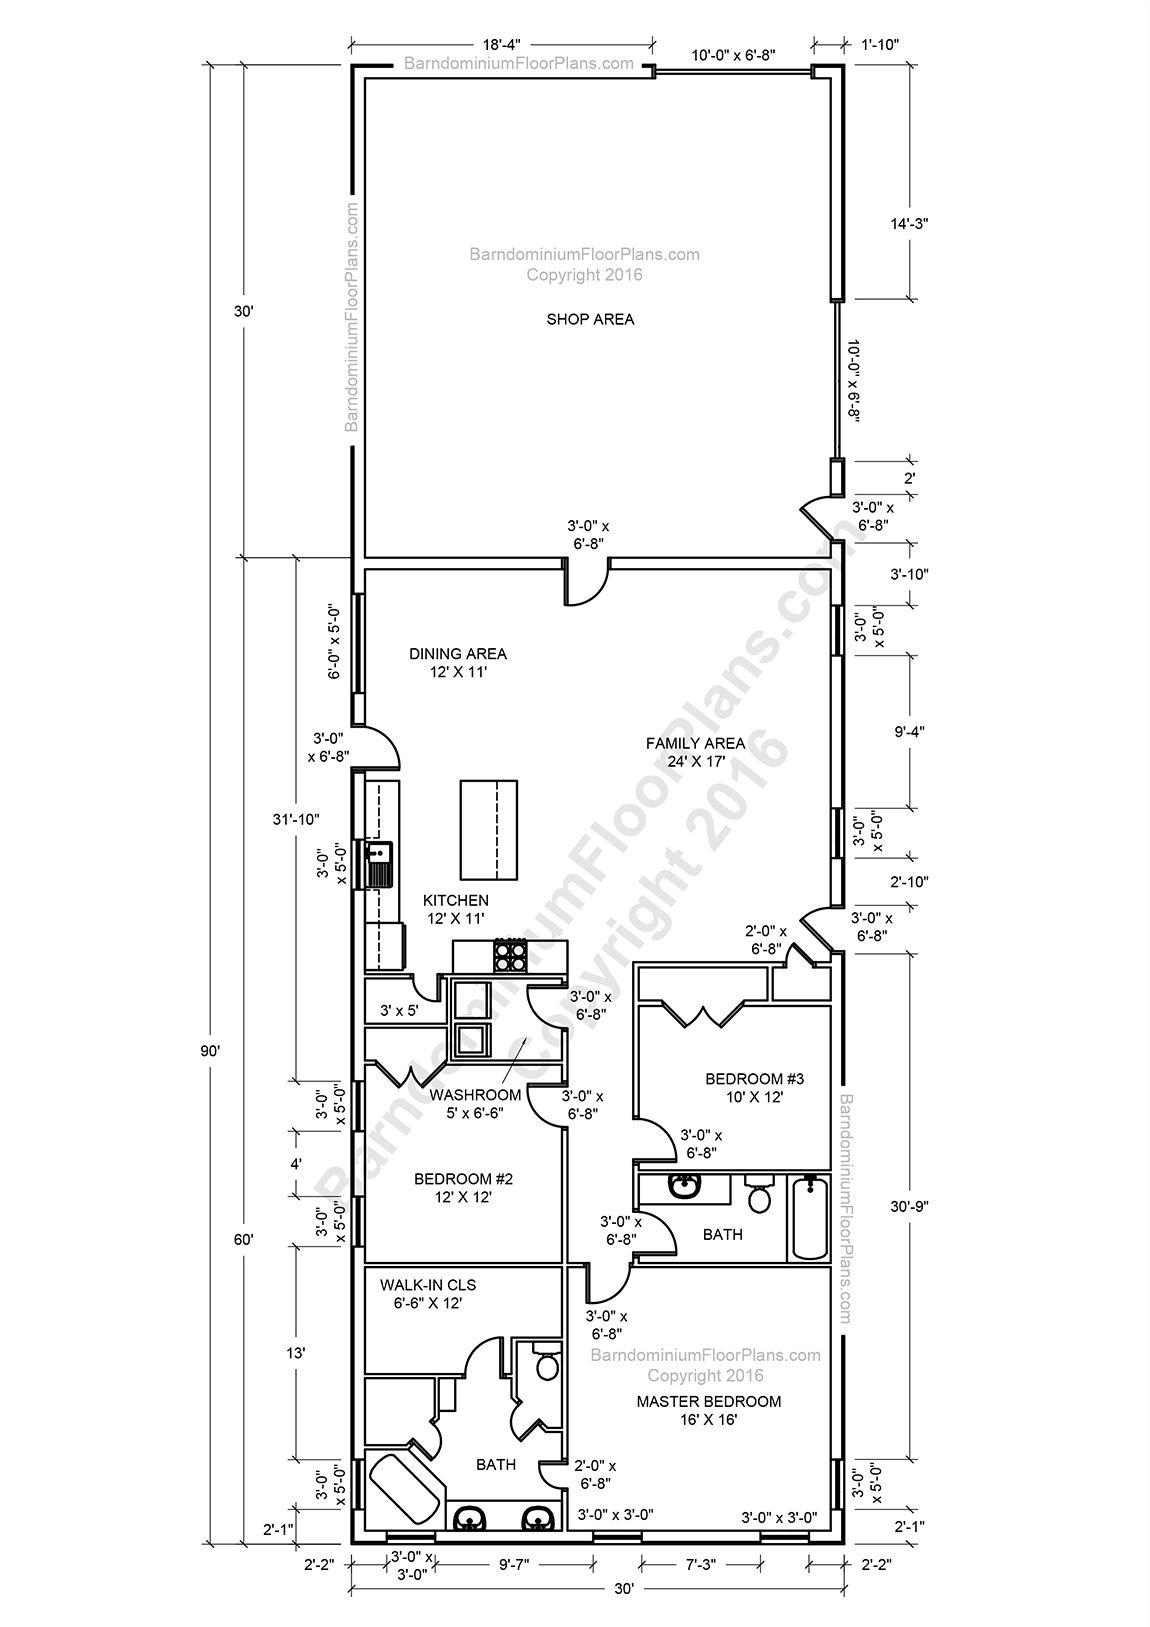 medium resolution of barndominium floor plans 2 story 4 bedroom with shop barndominium floor plans cost open concept small with garage metal buildings barn houses